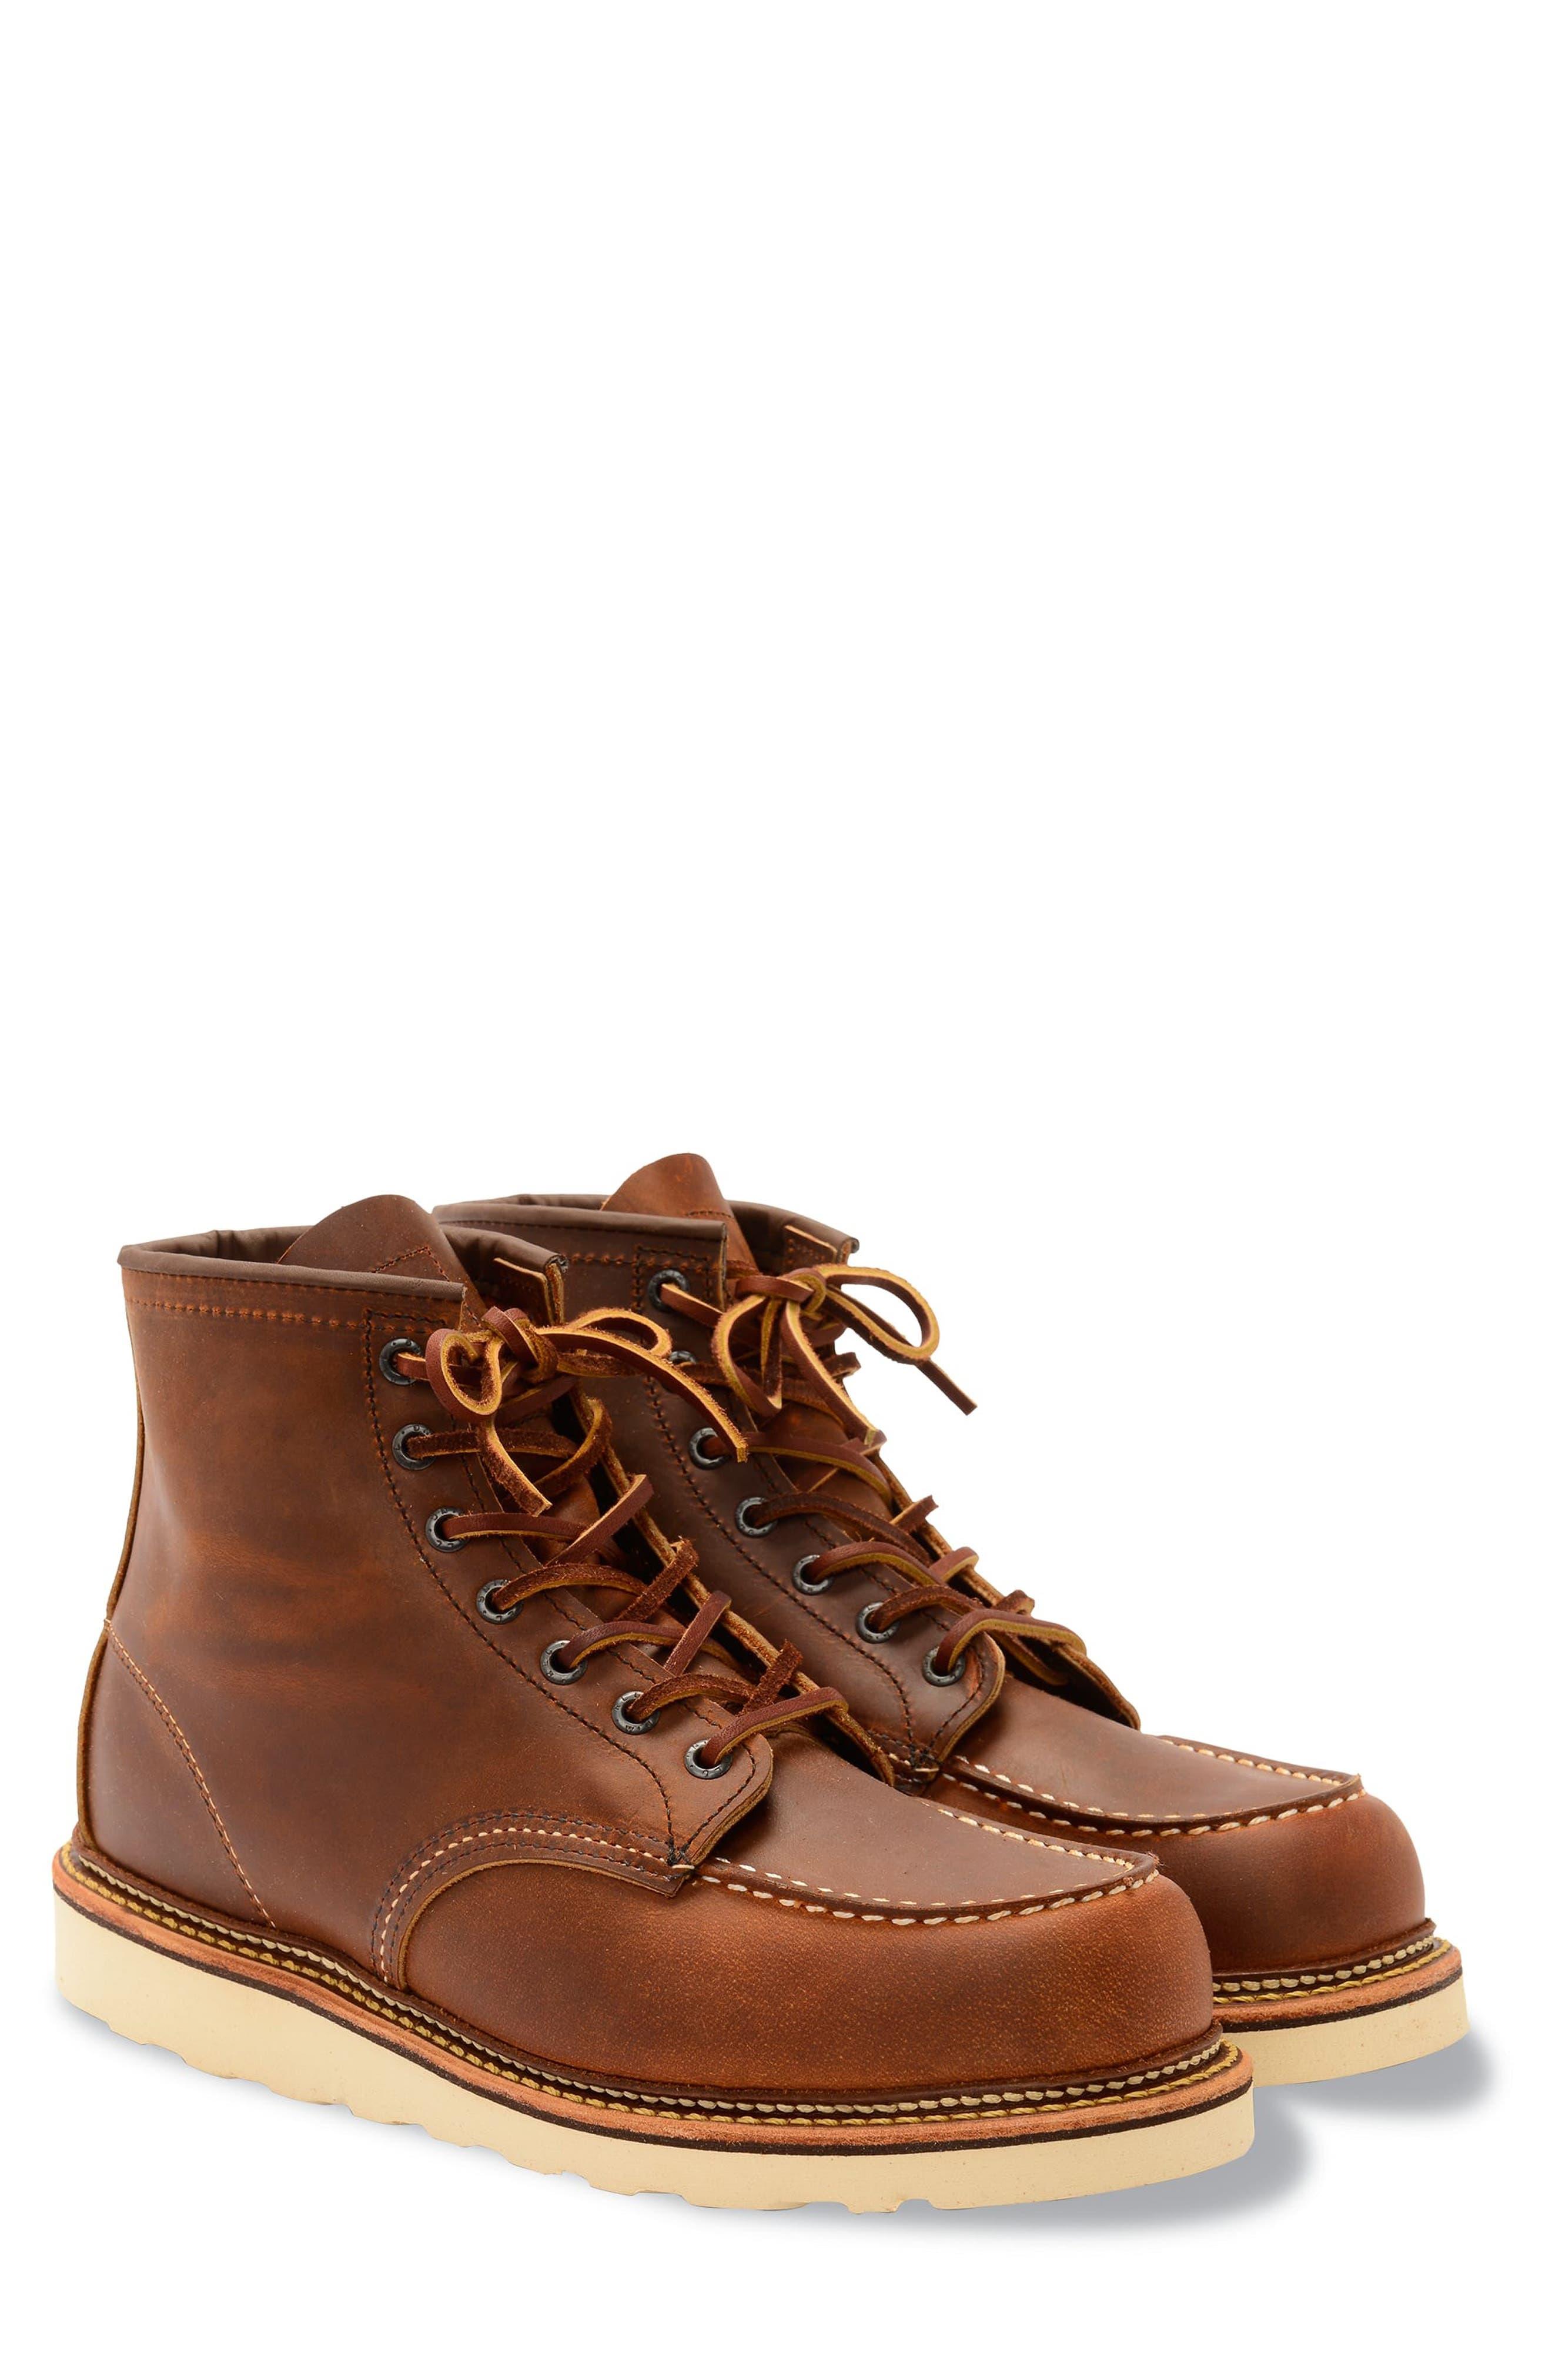 Moc Toe Boot,                         Main,                         color, COPPER BROWN- 1907